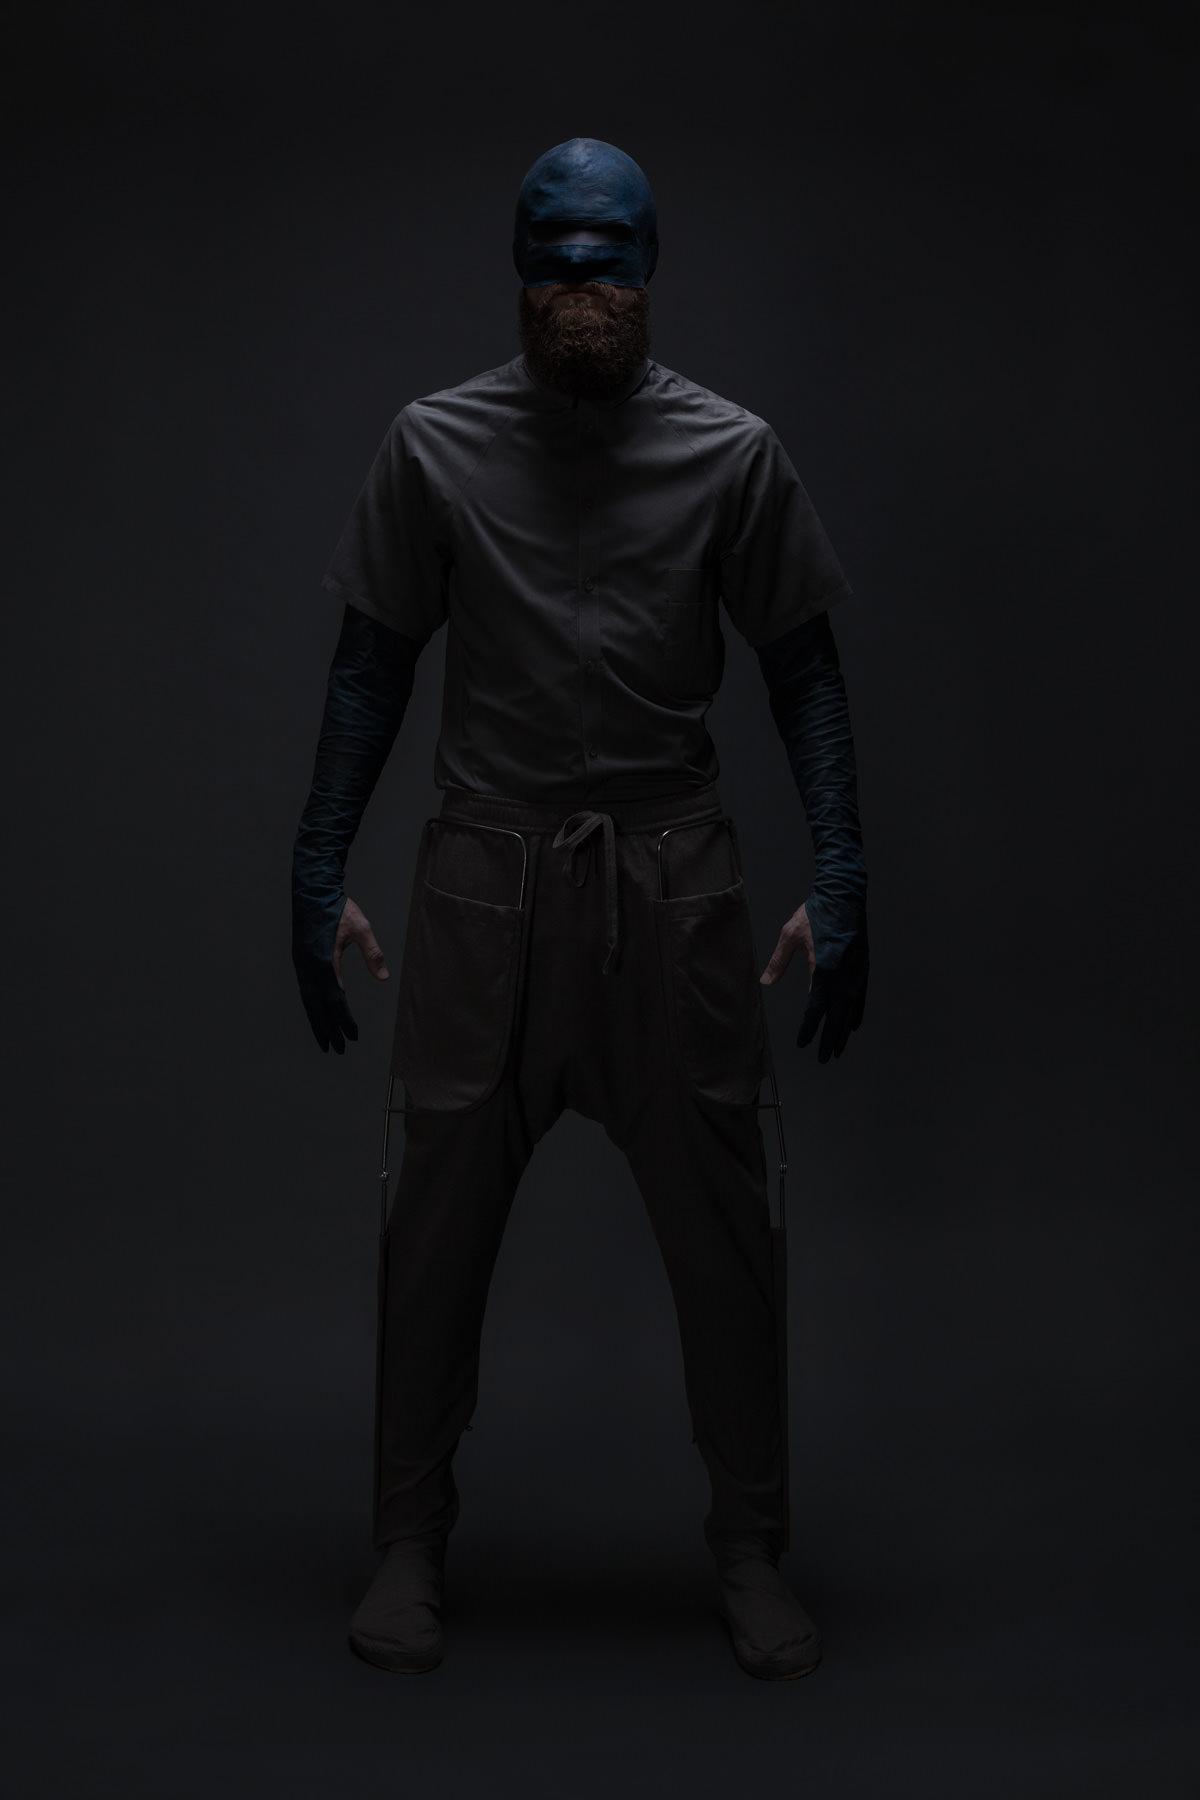 mode maske blau grauclukas fischer superior superhelden maske studio dunkel duster exoskelett jörn strojny